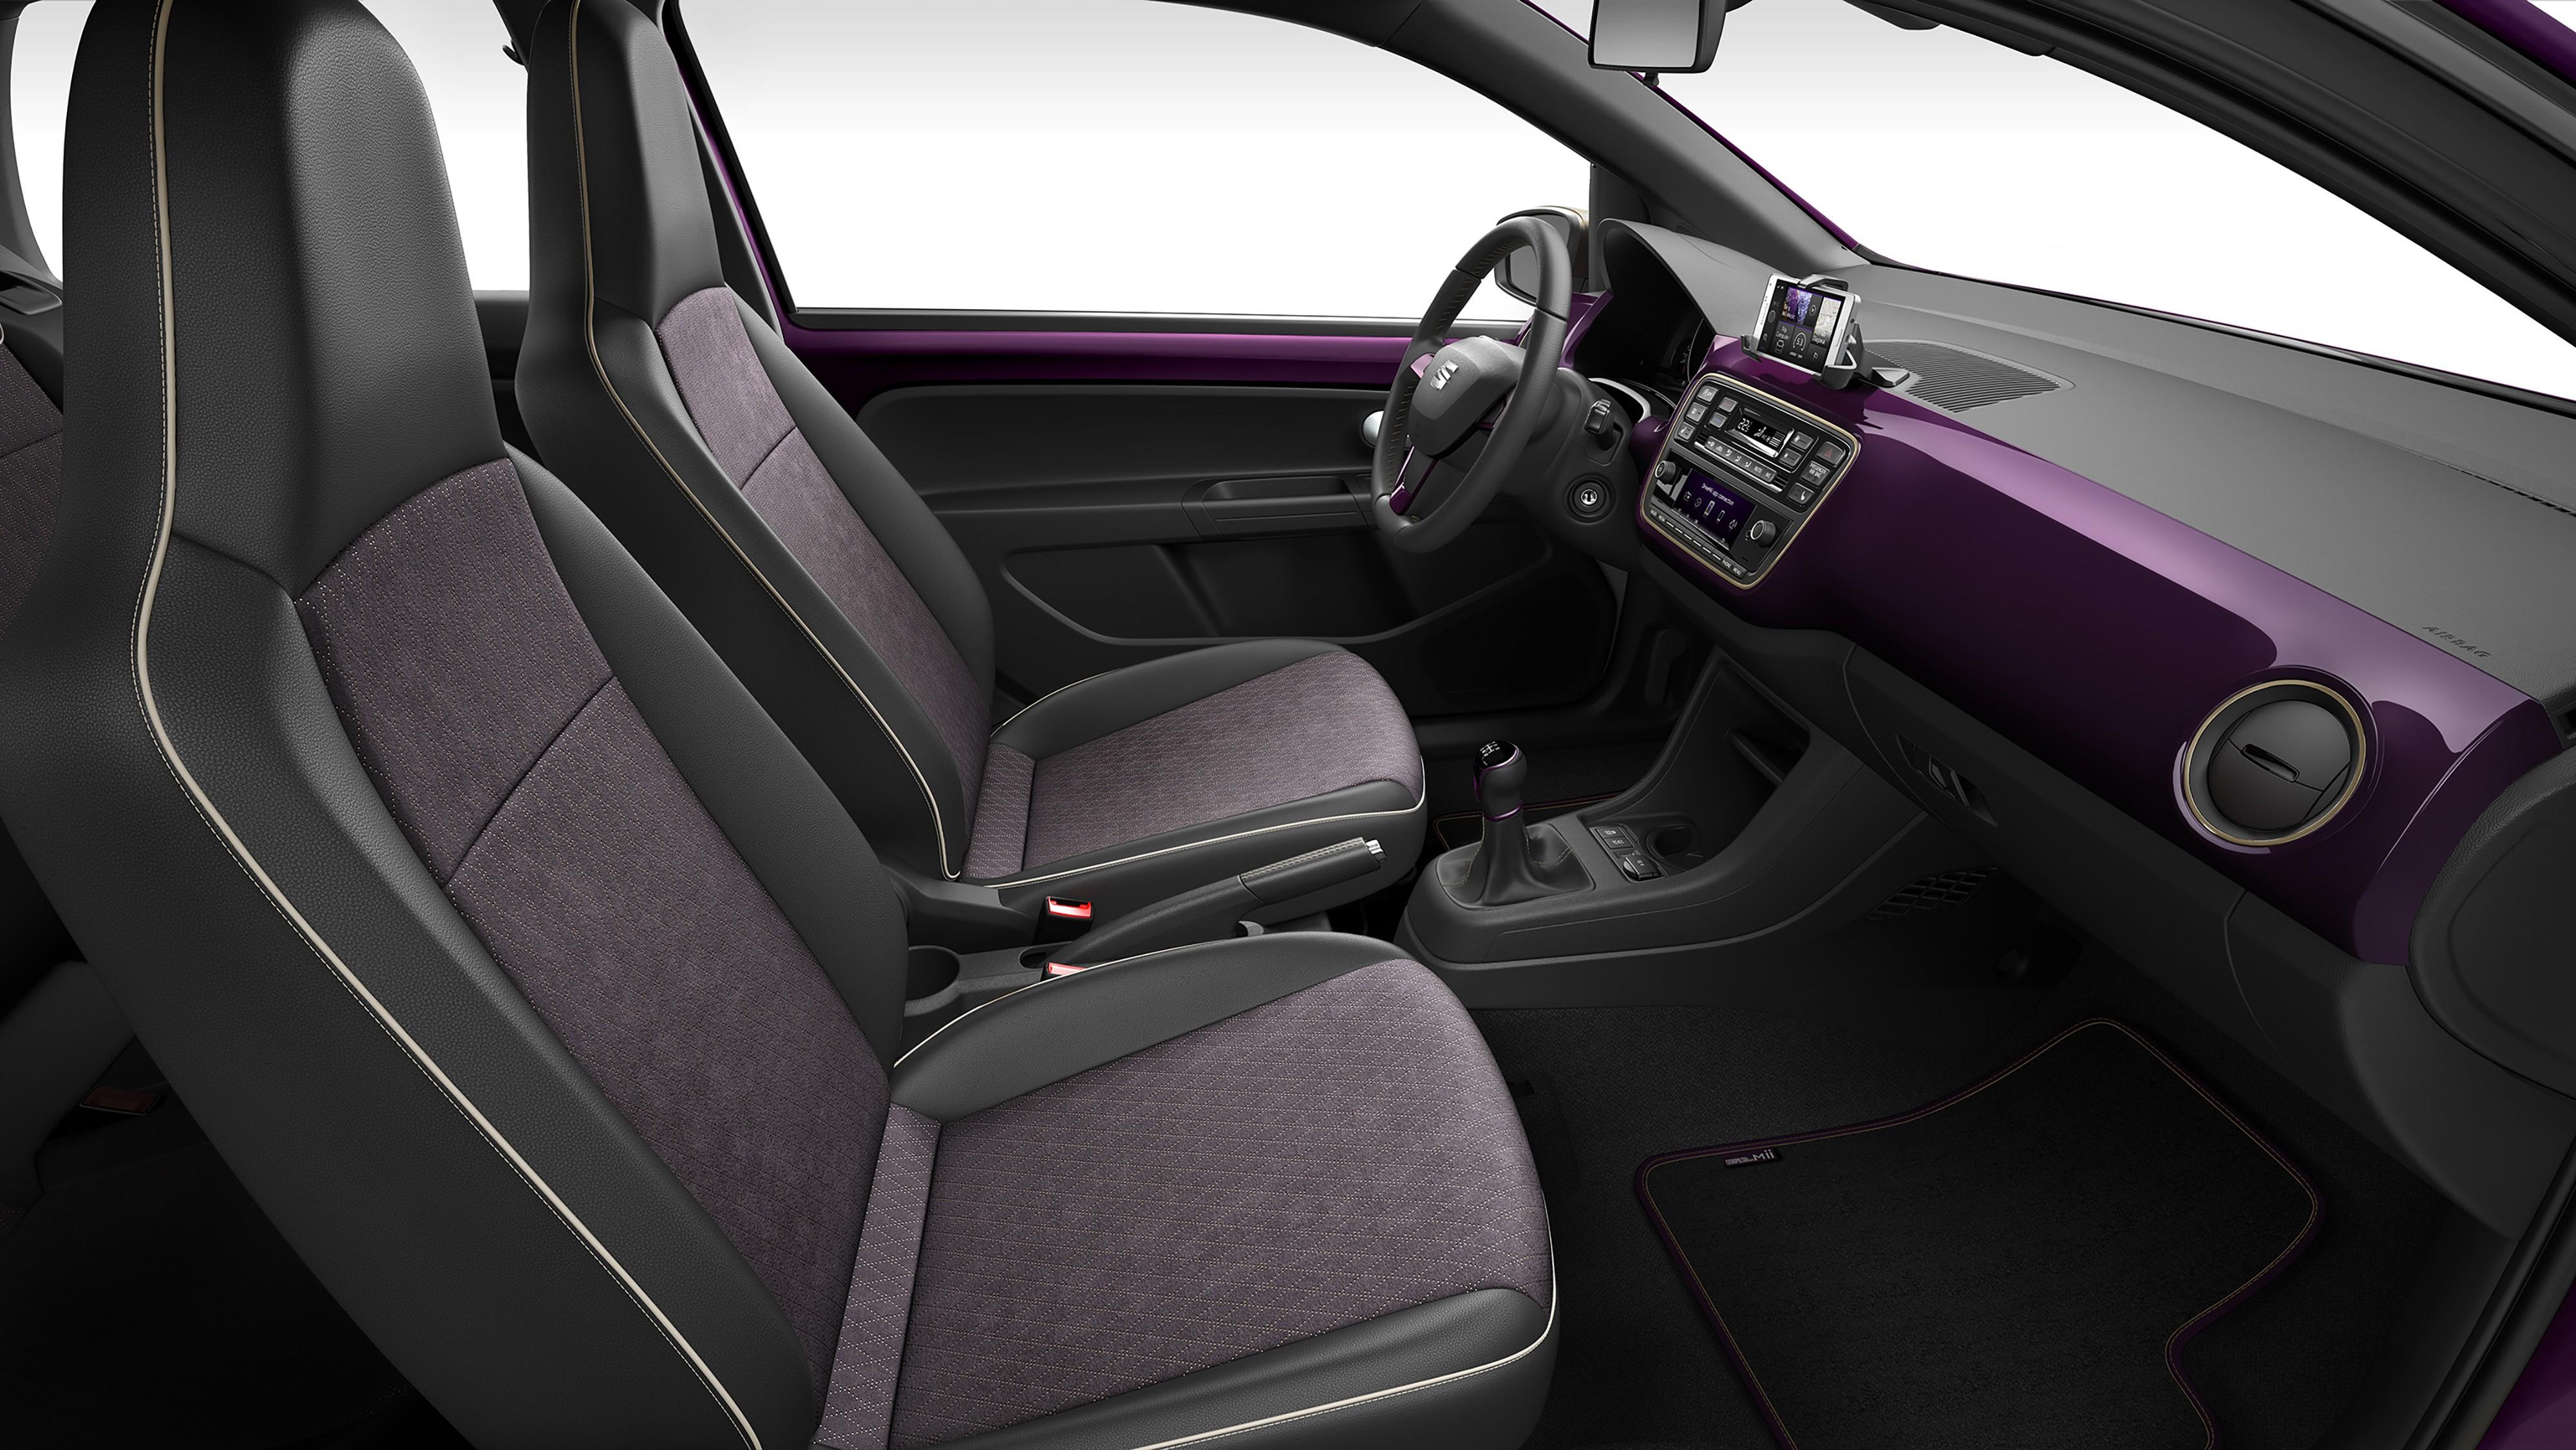 SEAT Mii by Cosmopolitan Is One Stylish City Car - autoevolution